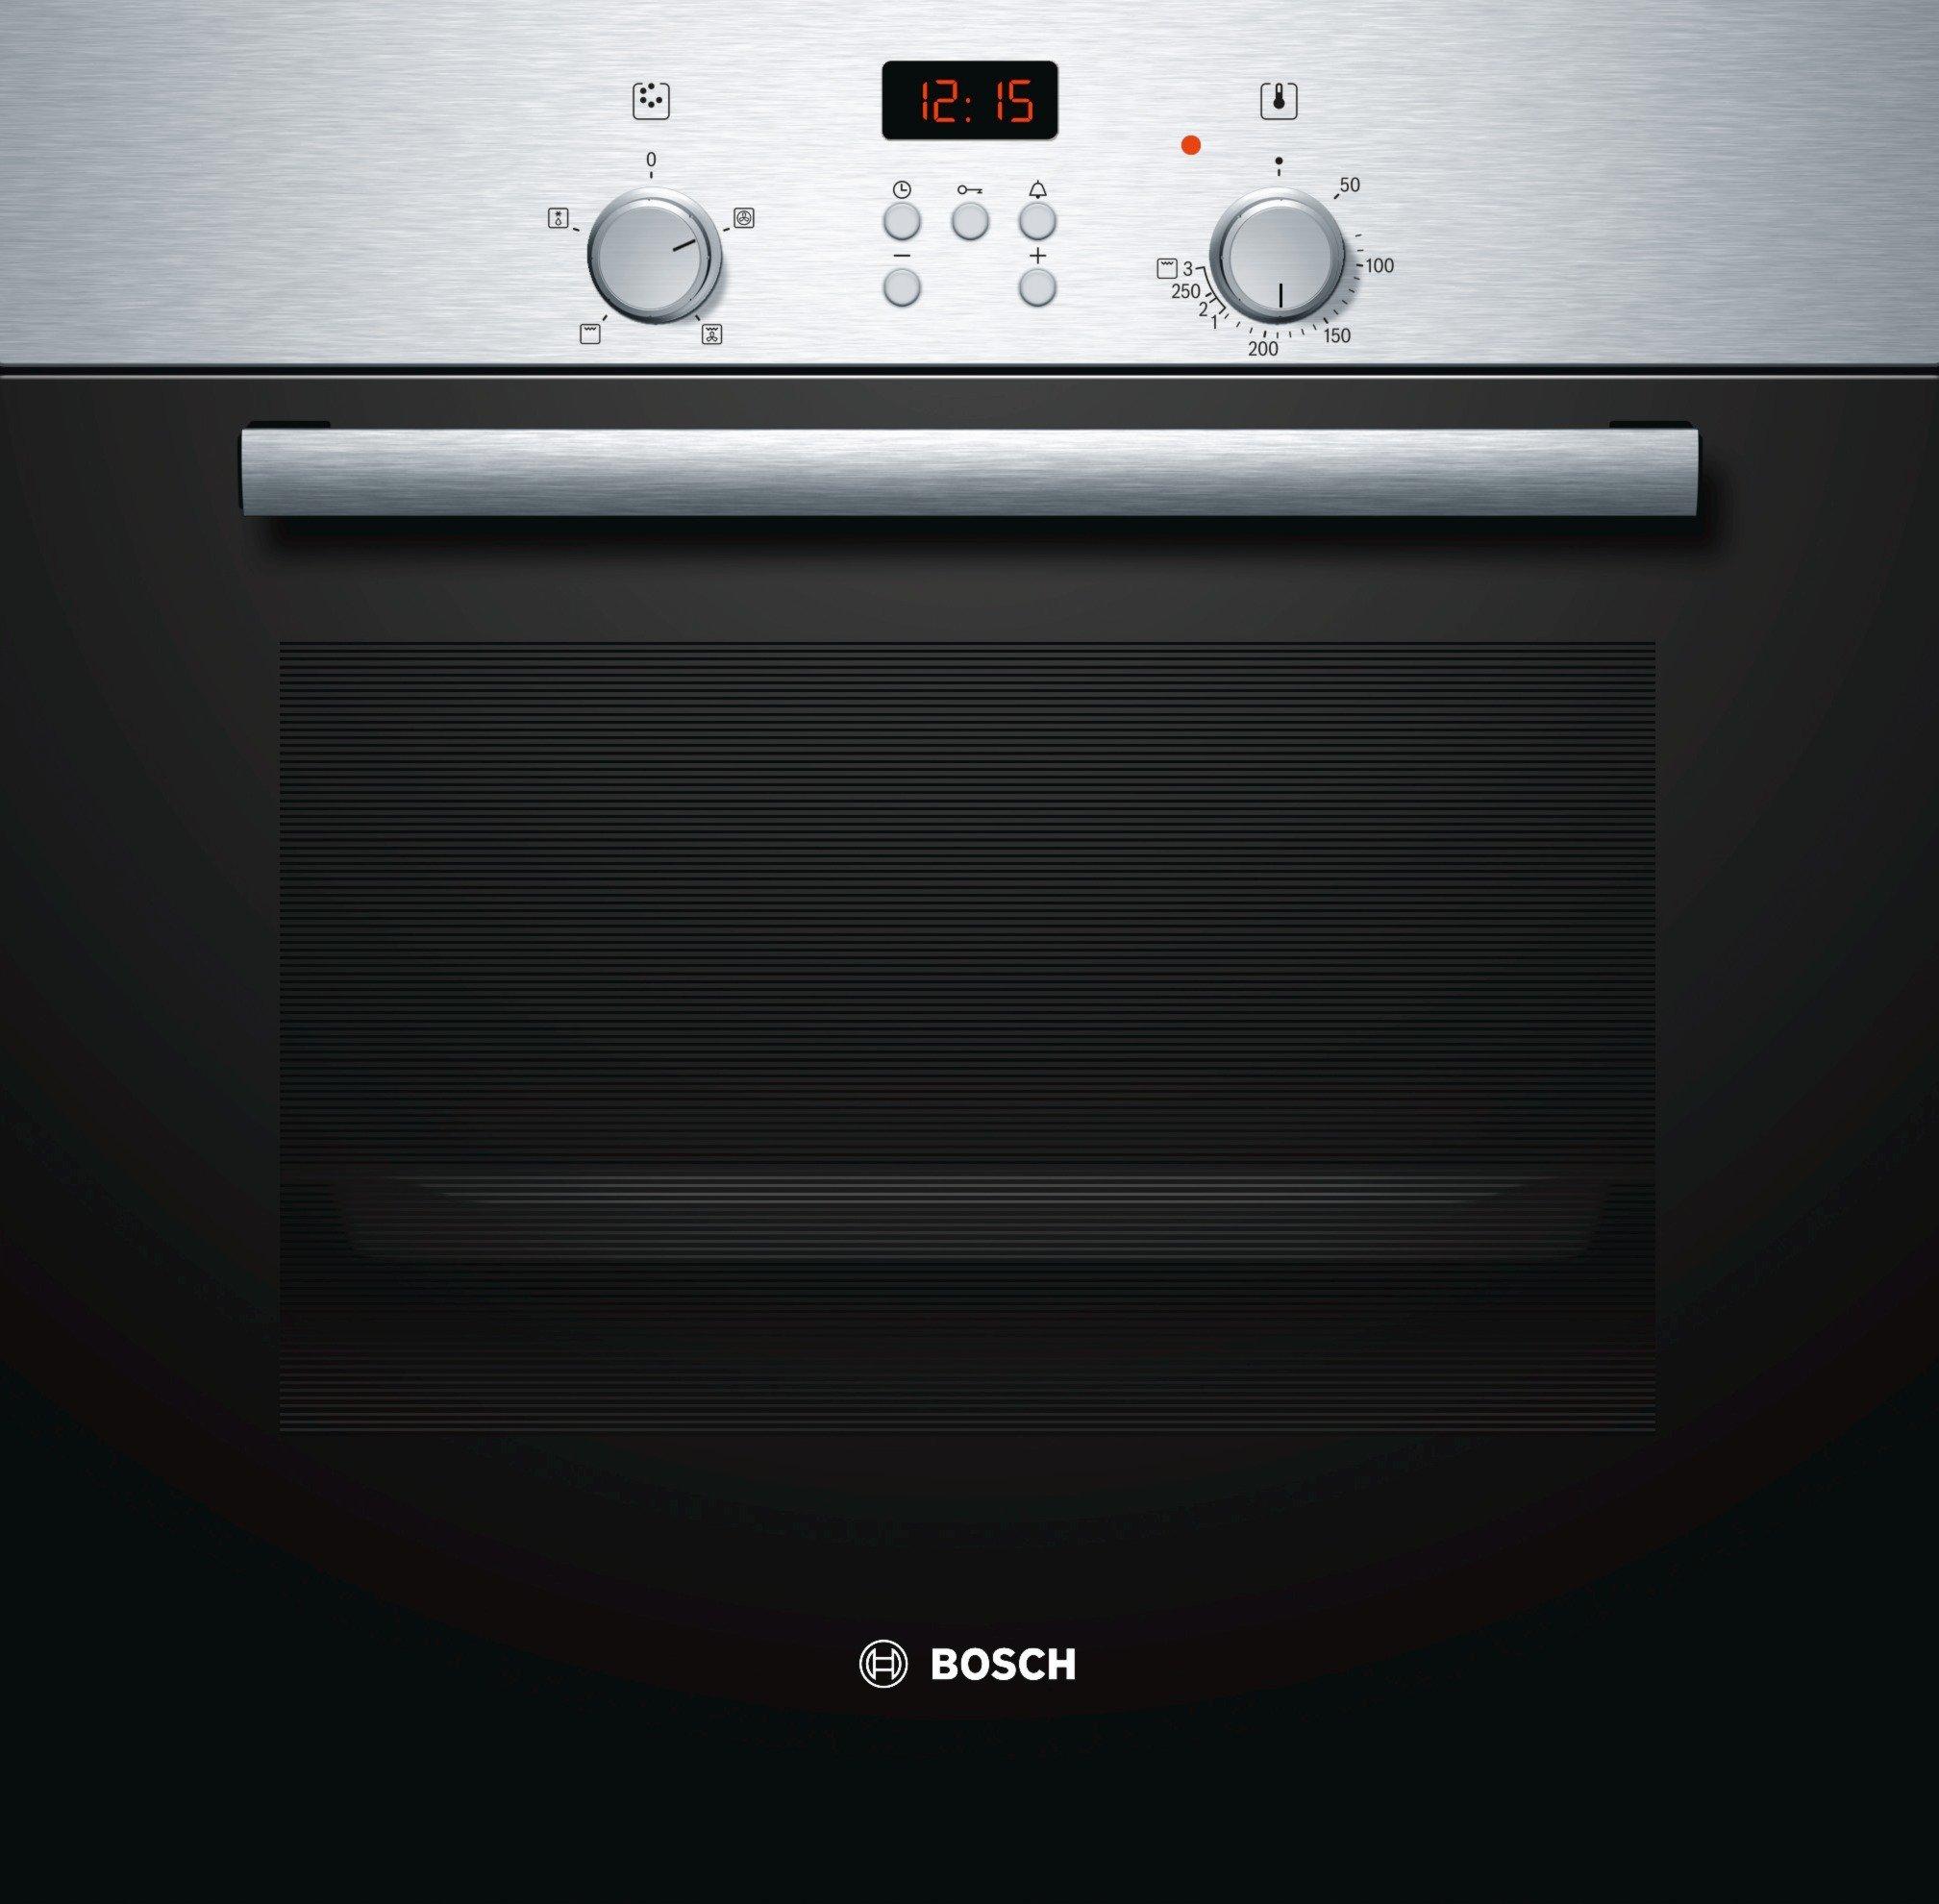 Bosch HBN331E4B Built-In Single Oven - Stainless Steel.